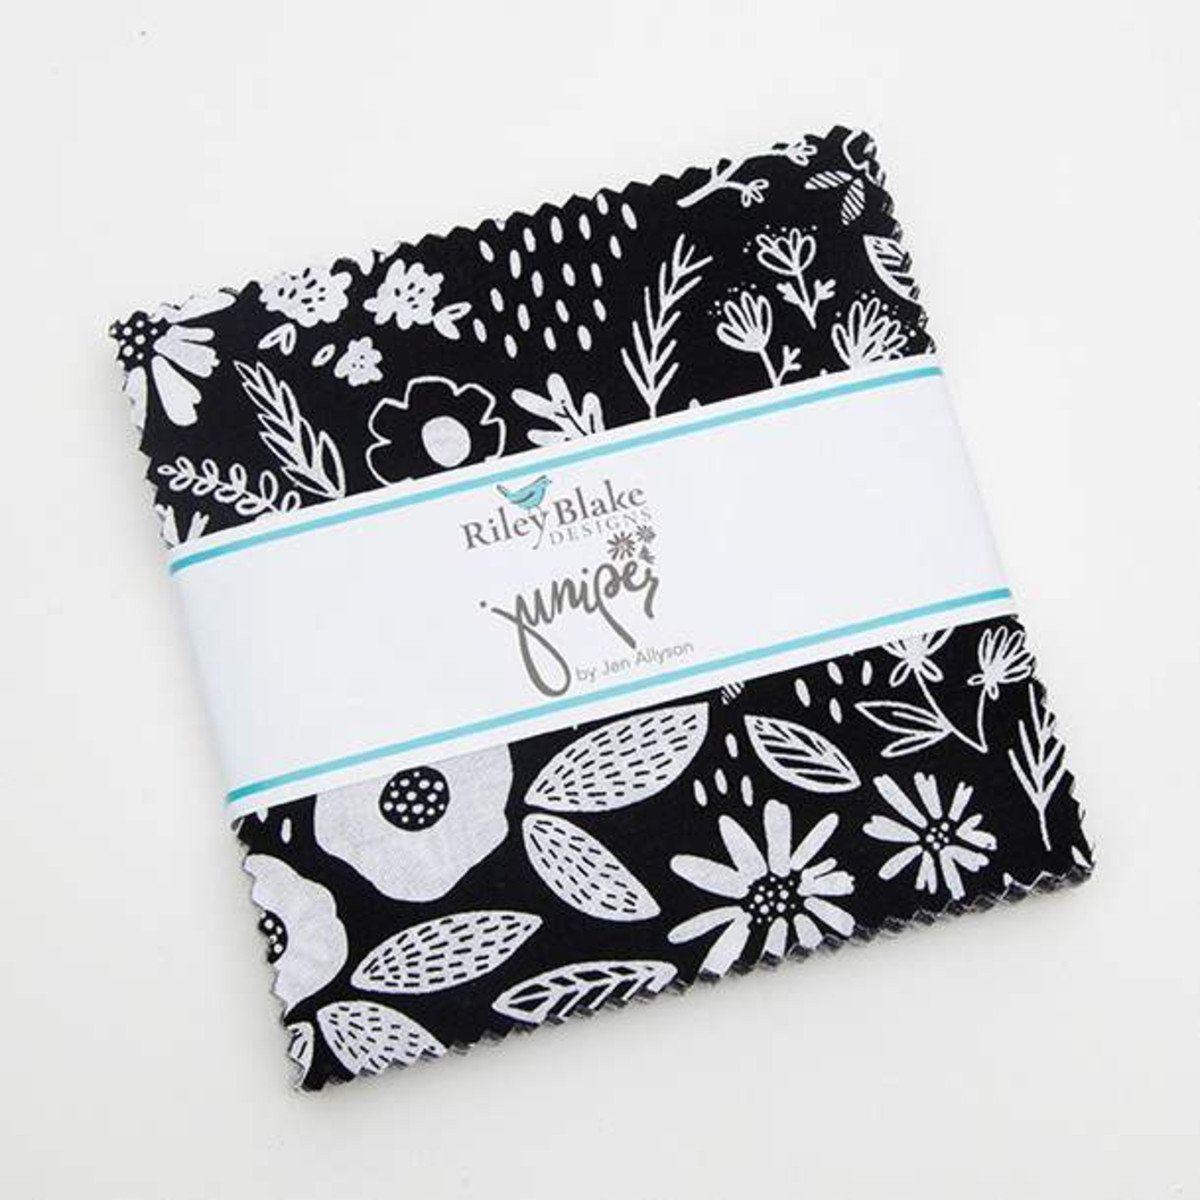 42 Pcs Riley Blake Designs Precut Fabric Bees Life 5 Inch Stacker